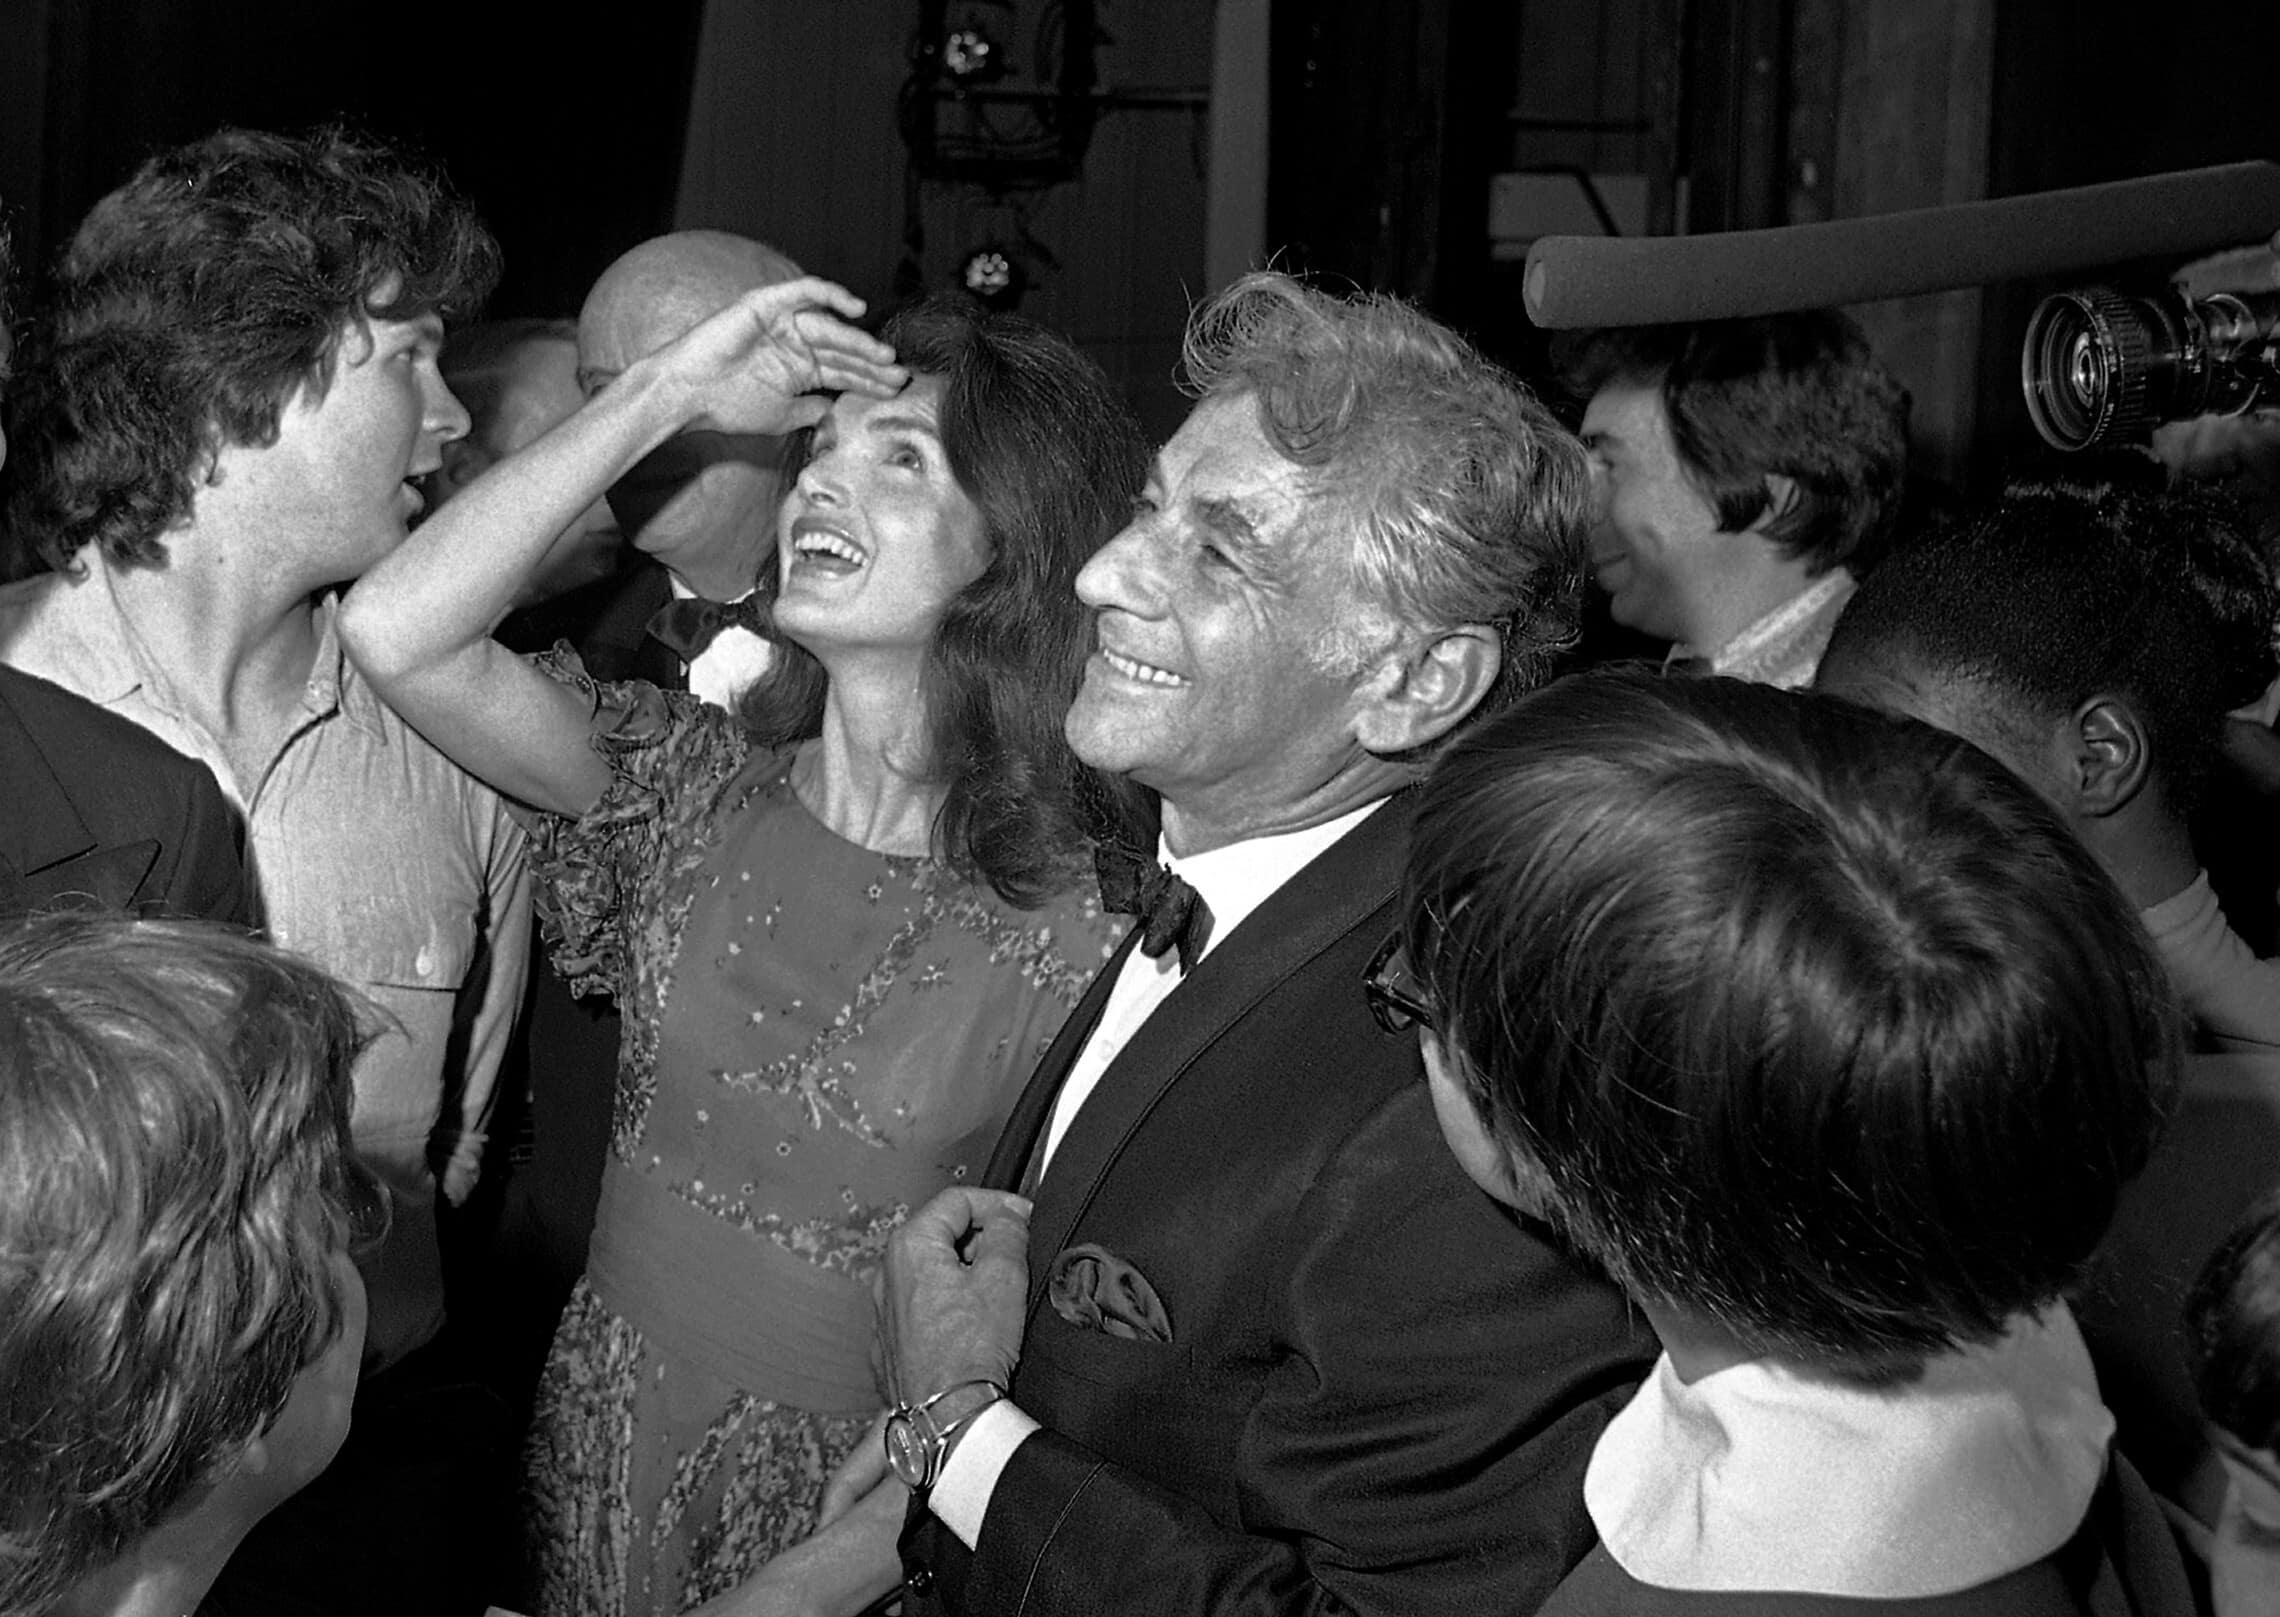 לאונרד ברנשטיין עם ג'קי קנדי אונאסיס ב-1972 (צילום: AP Photo)